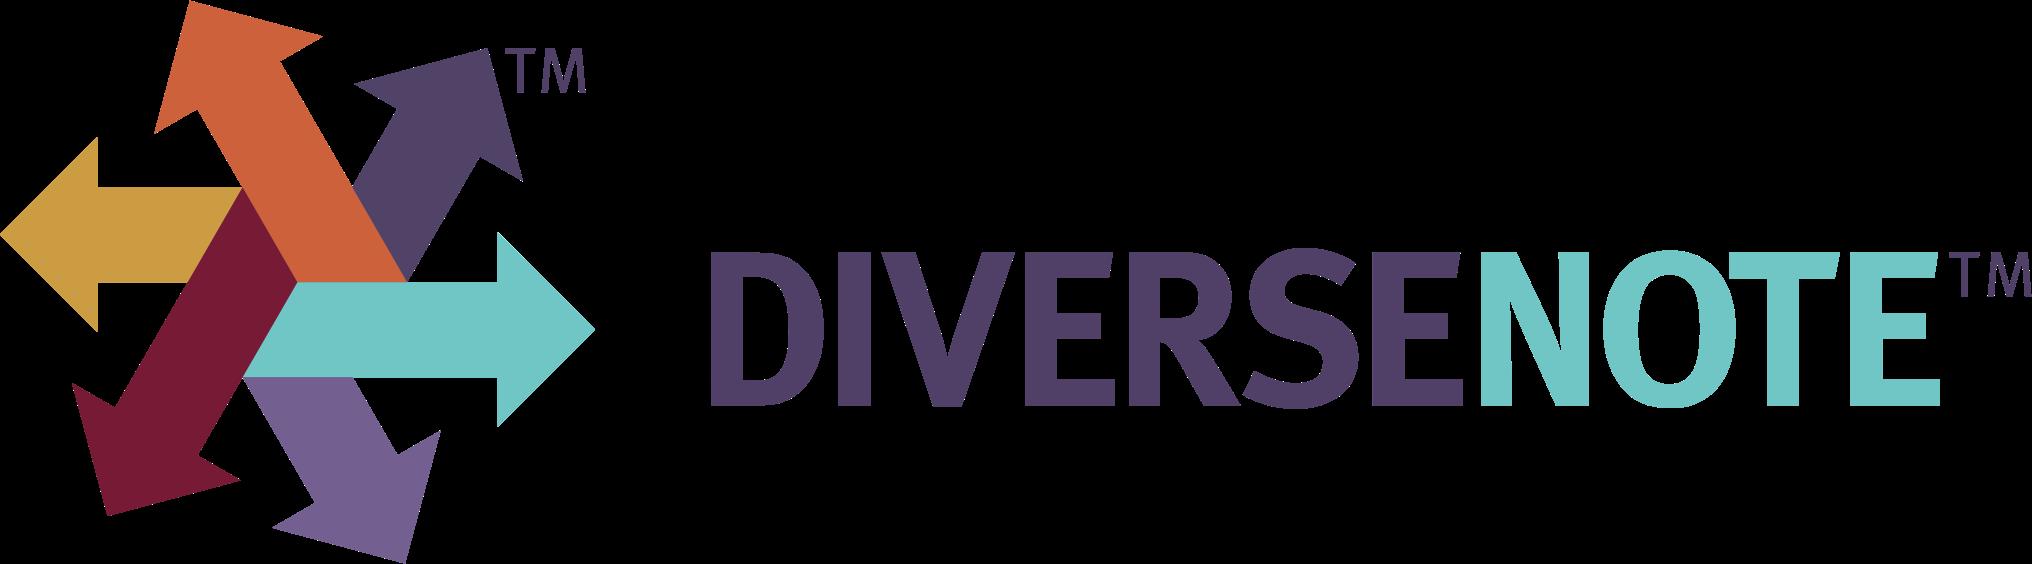 DiverseNote